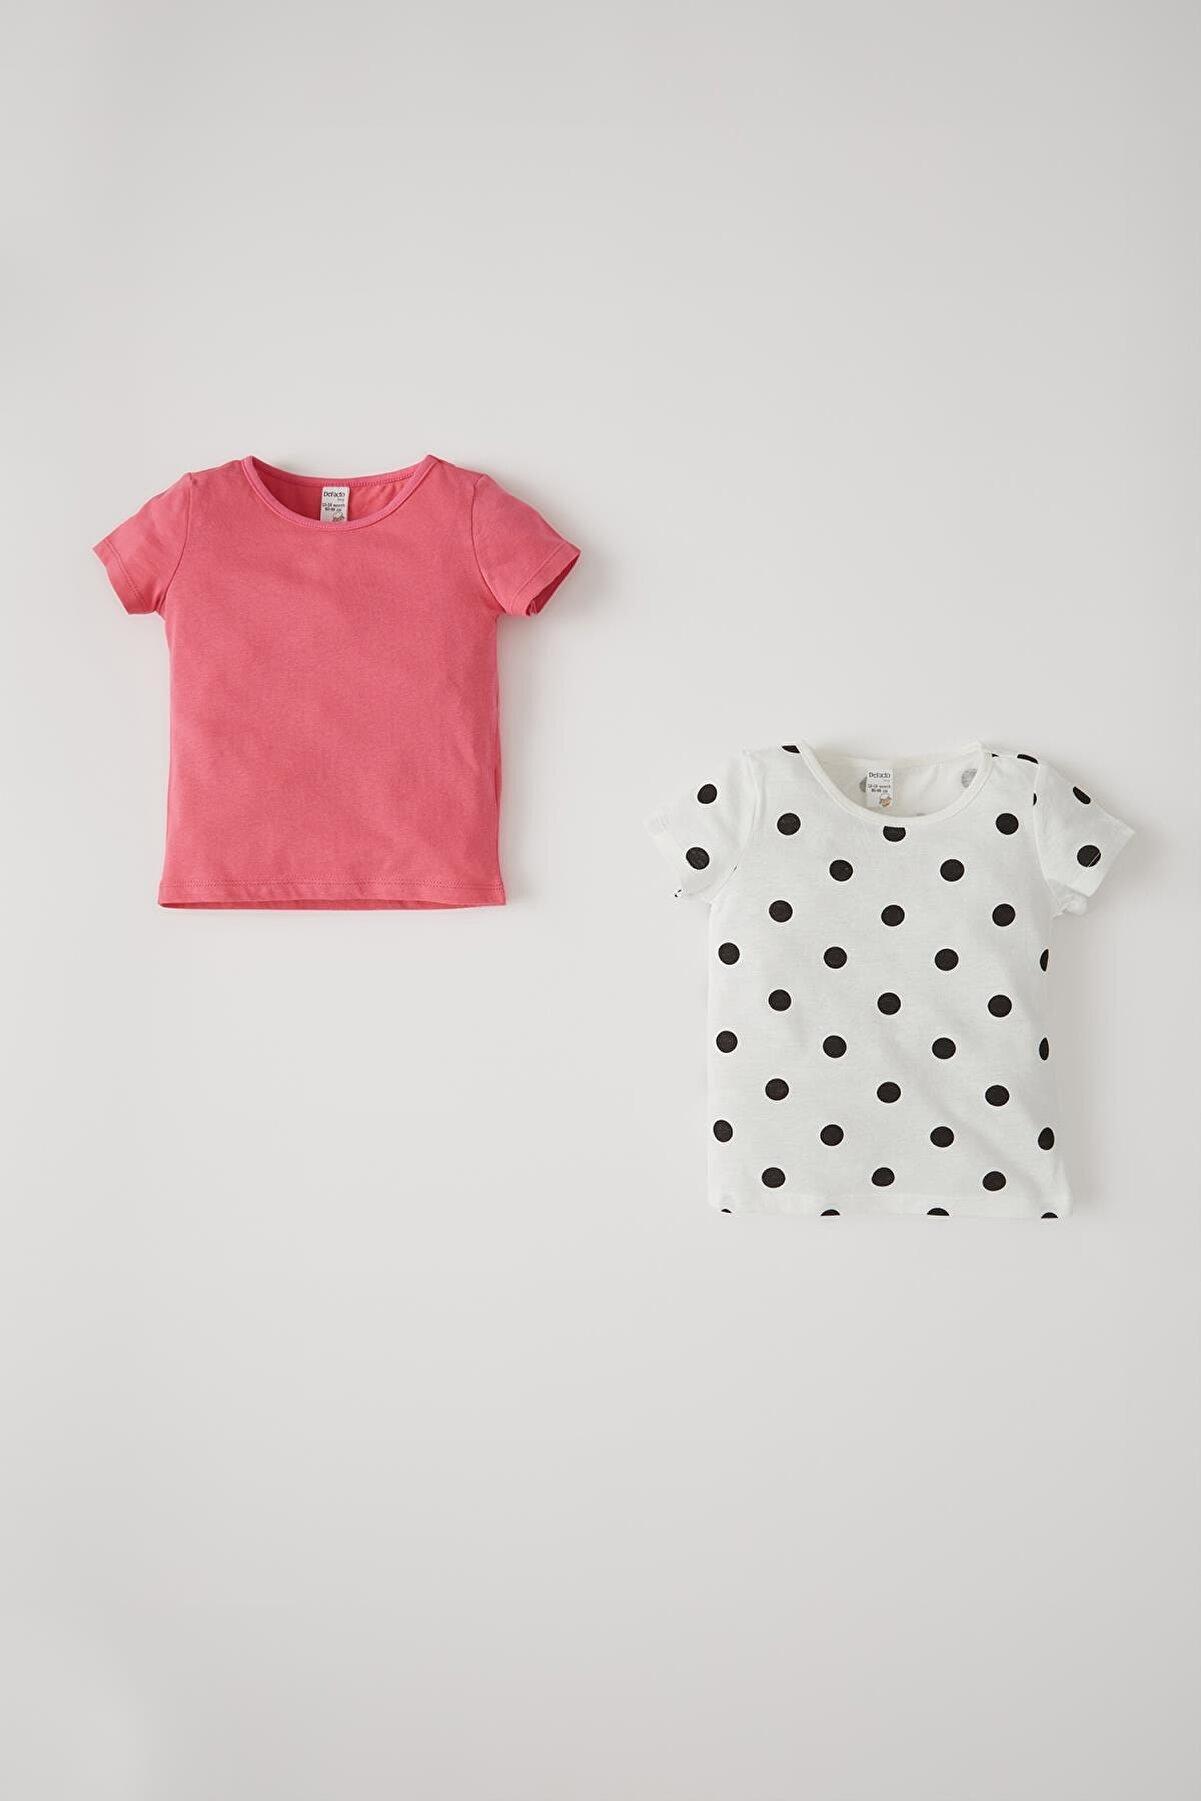 Defacto Kız Bebek Puantiye Desenli 2'li Kısa Kol Pamuklu Tişört